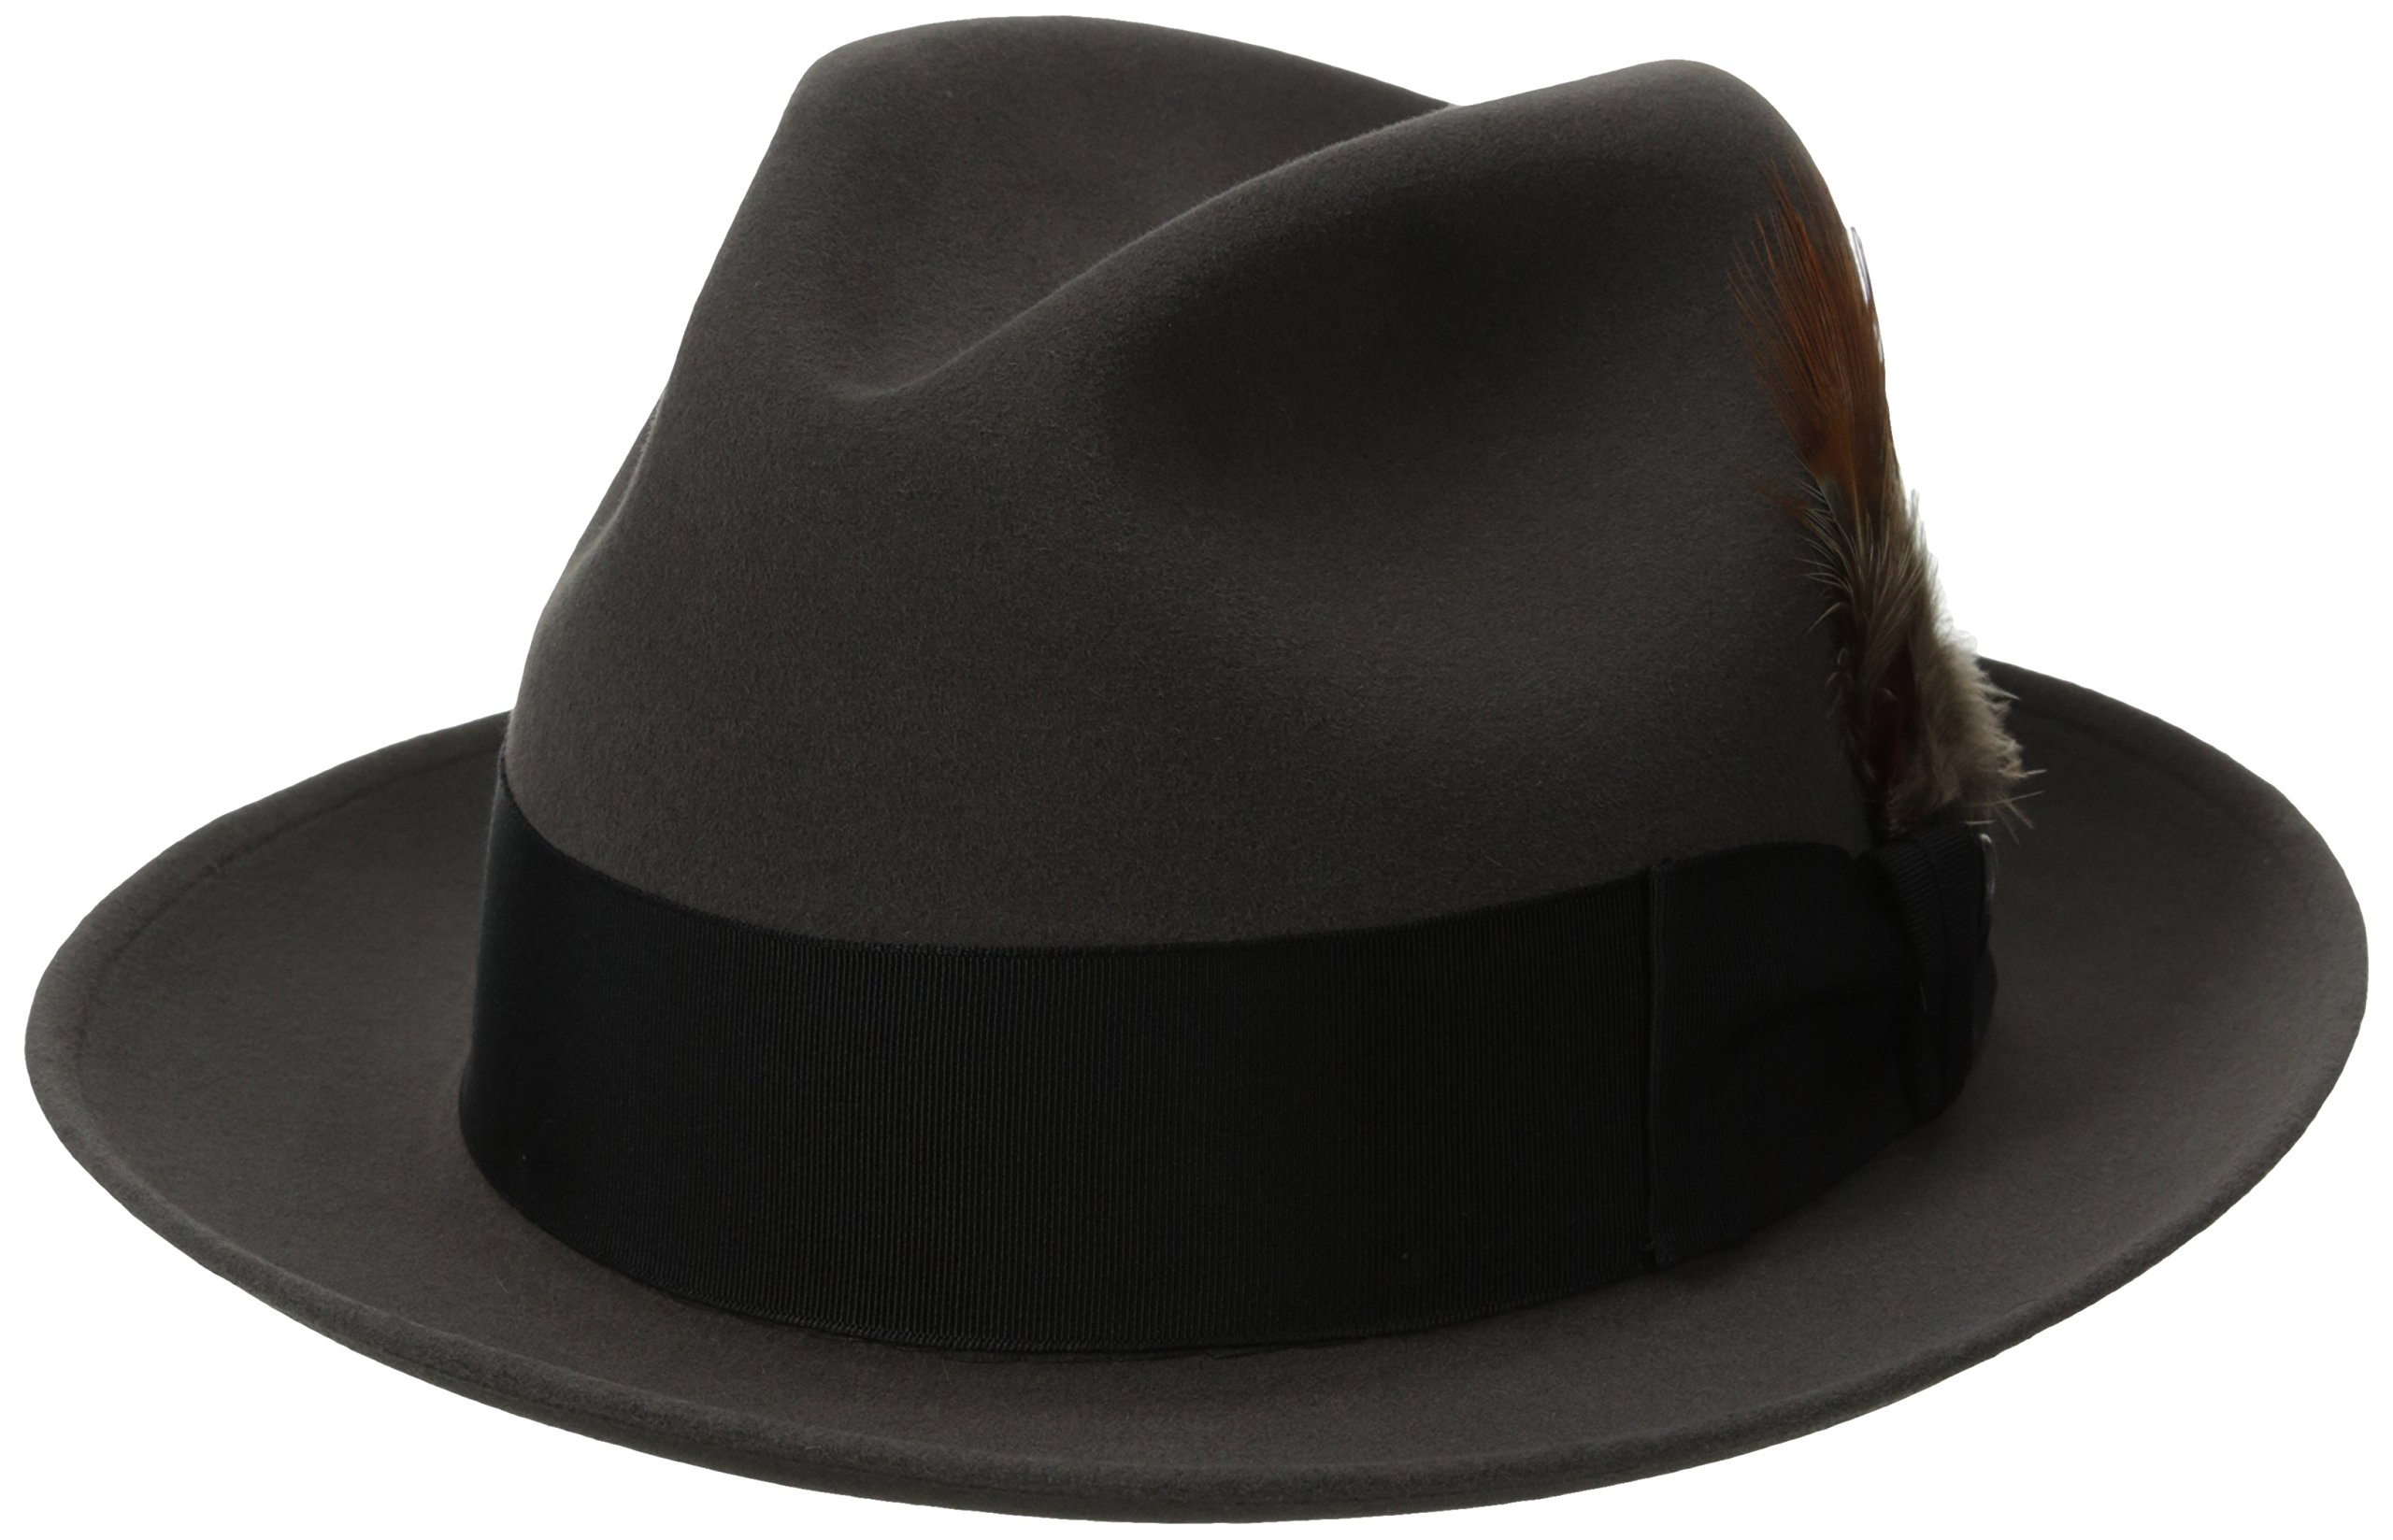 Stetson Men's Saxon Royal Quality Fur Felt Hat, Caribou, 7.125